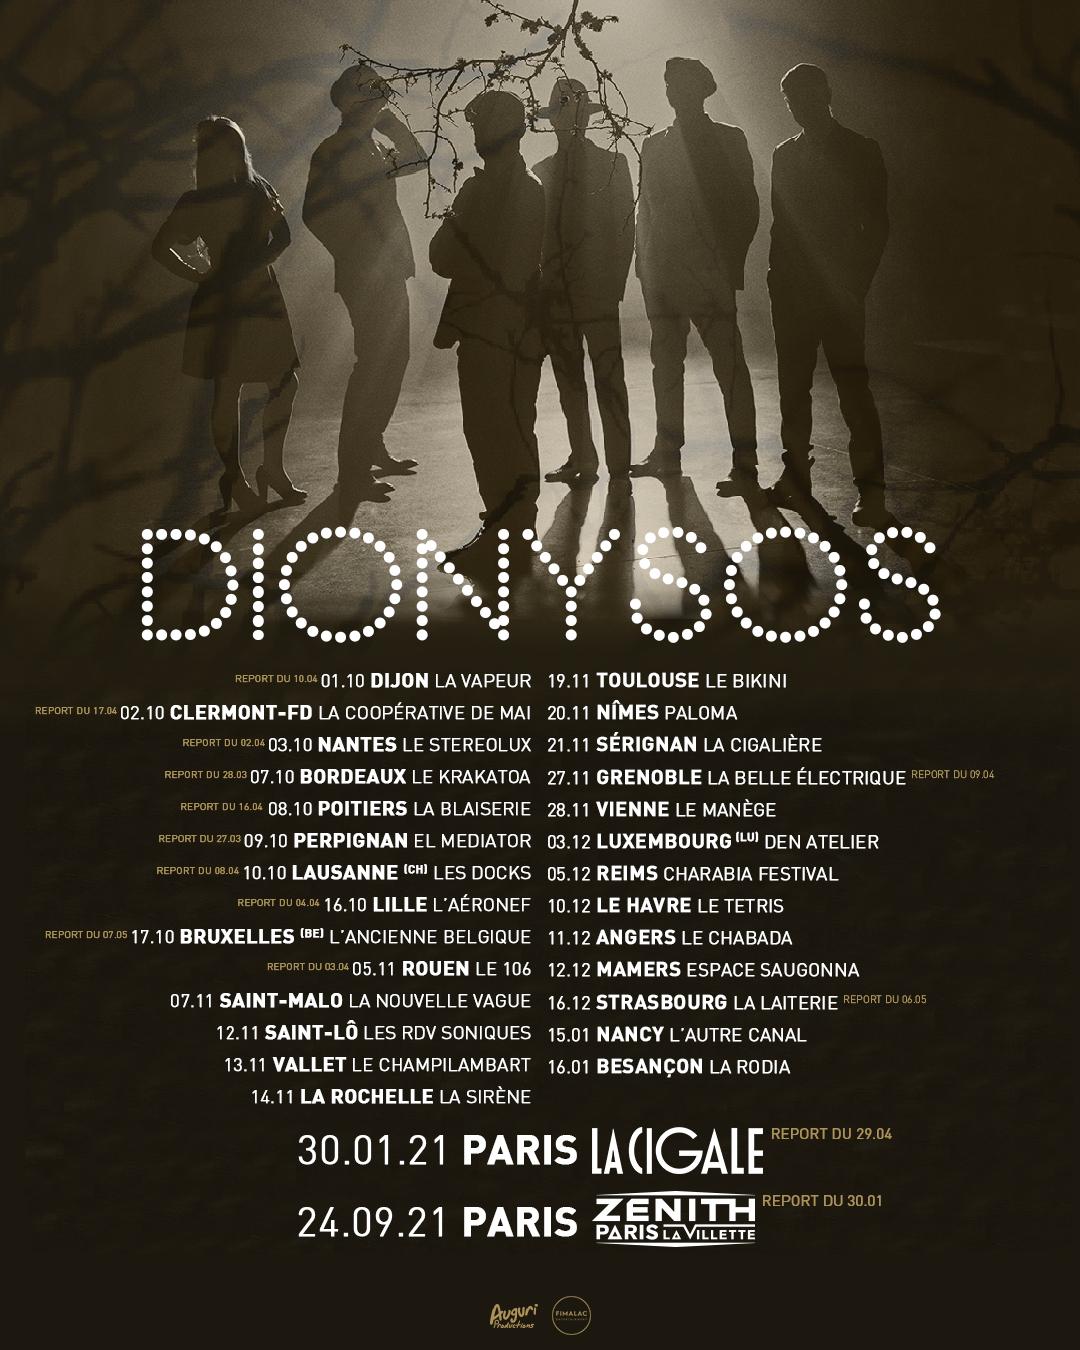 Dionysos - Surprisier - Tournée 2020